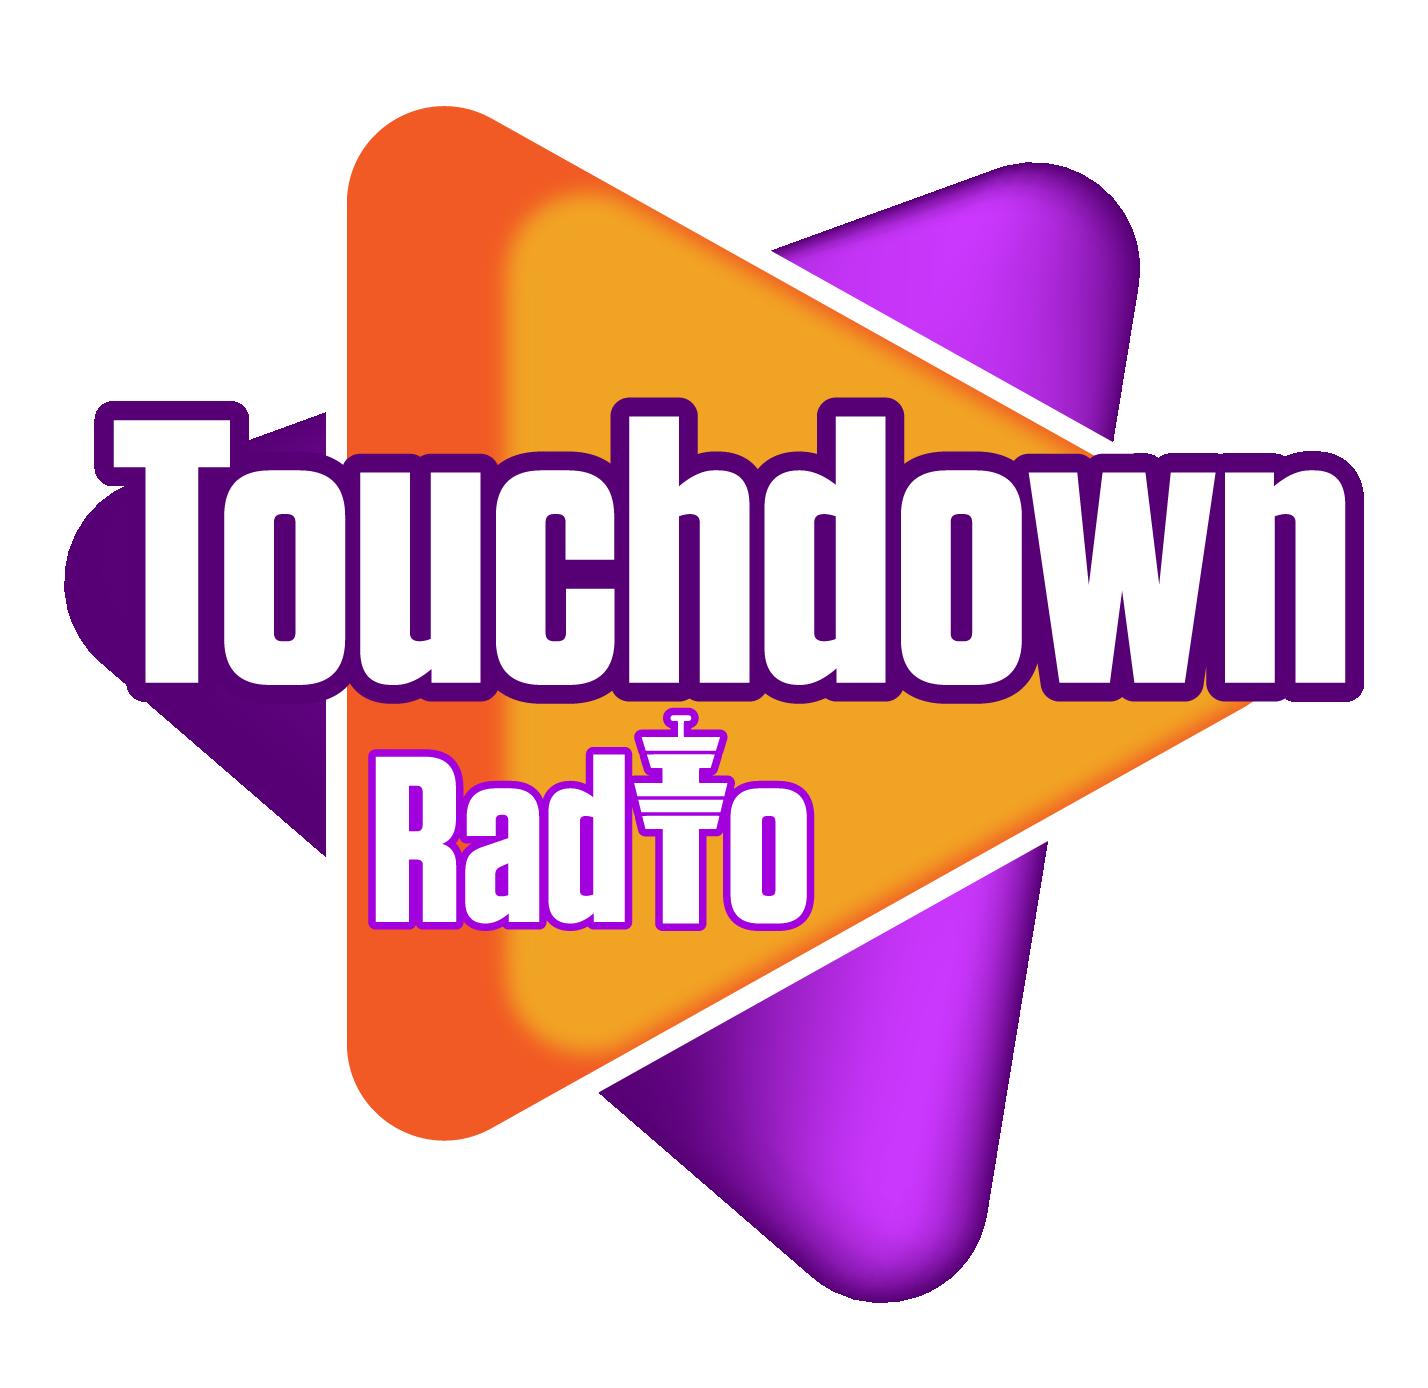 TOUCHDOWN RADIO - LOGO